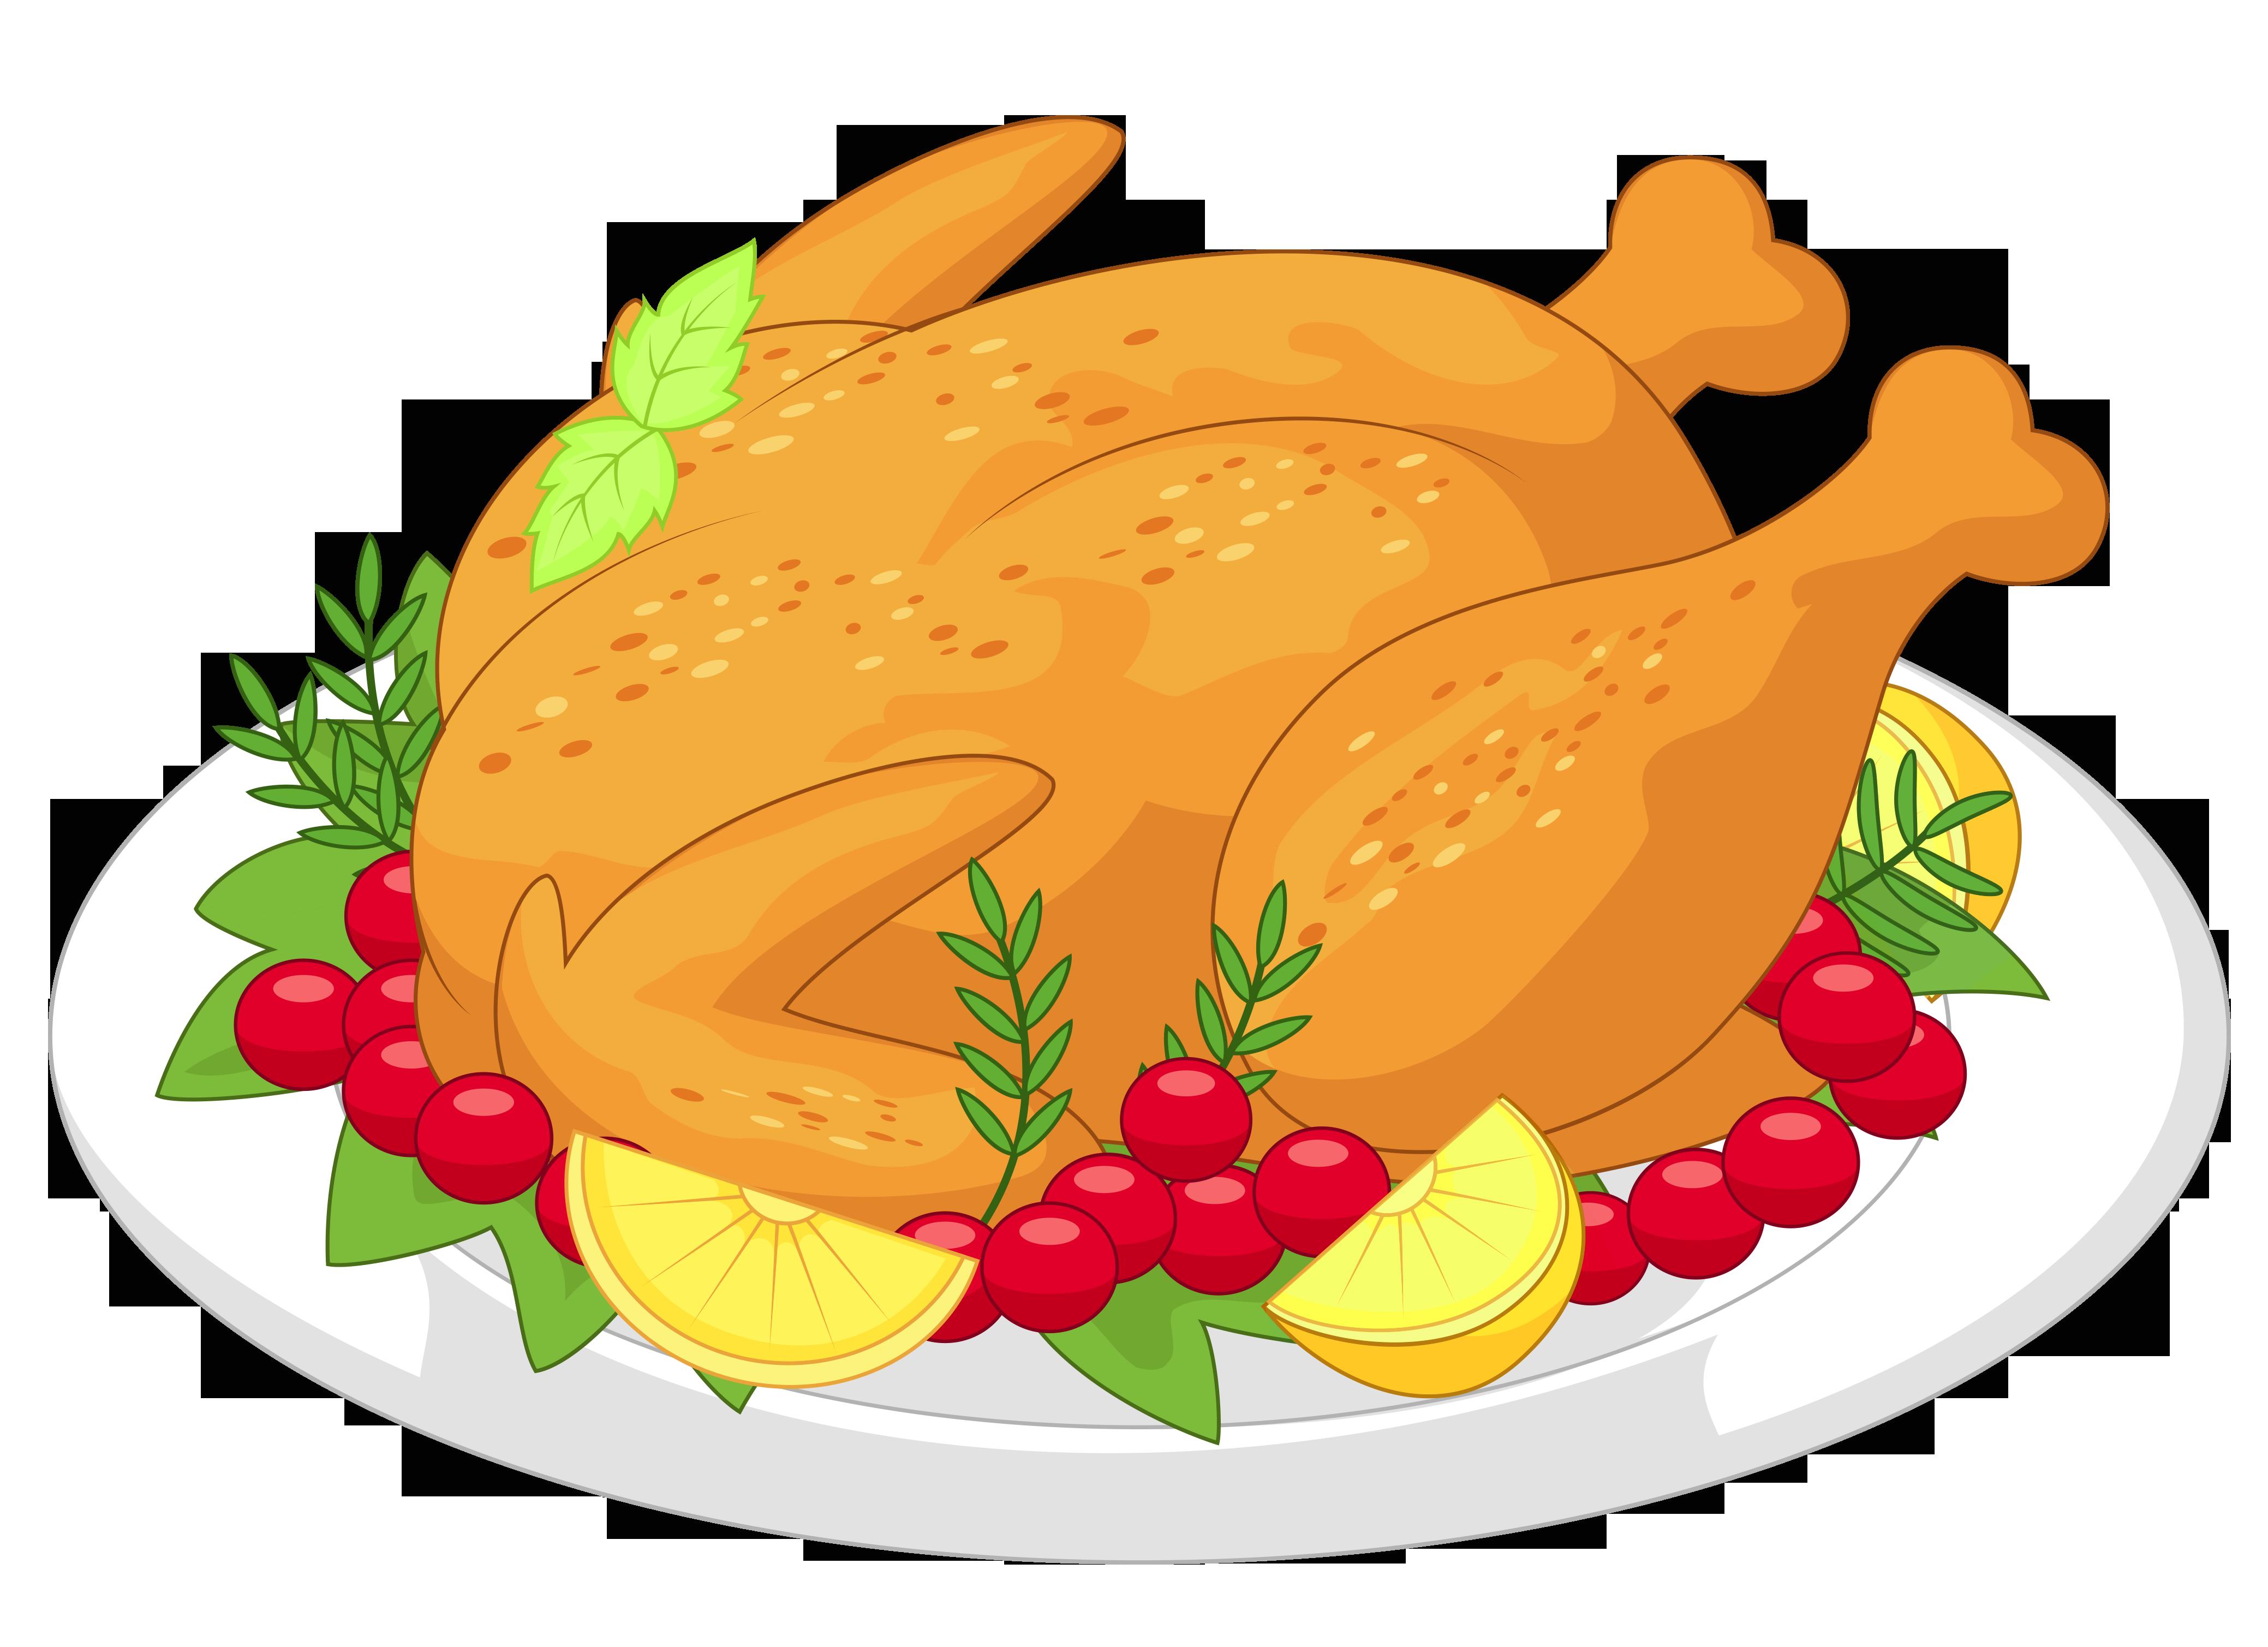 Free Food Turkey Cliparts, Download Free Clip Art, Free ...